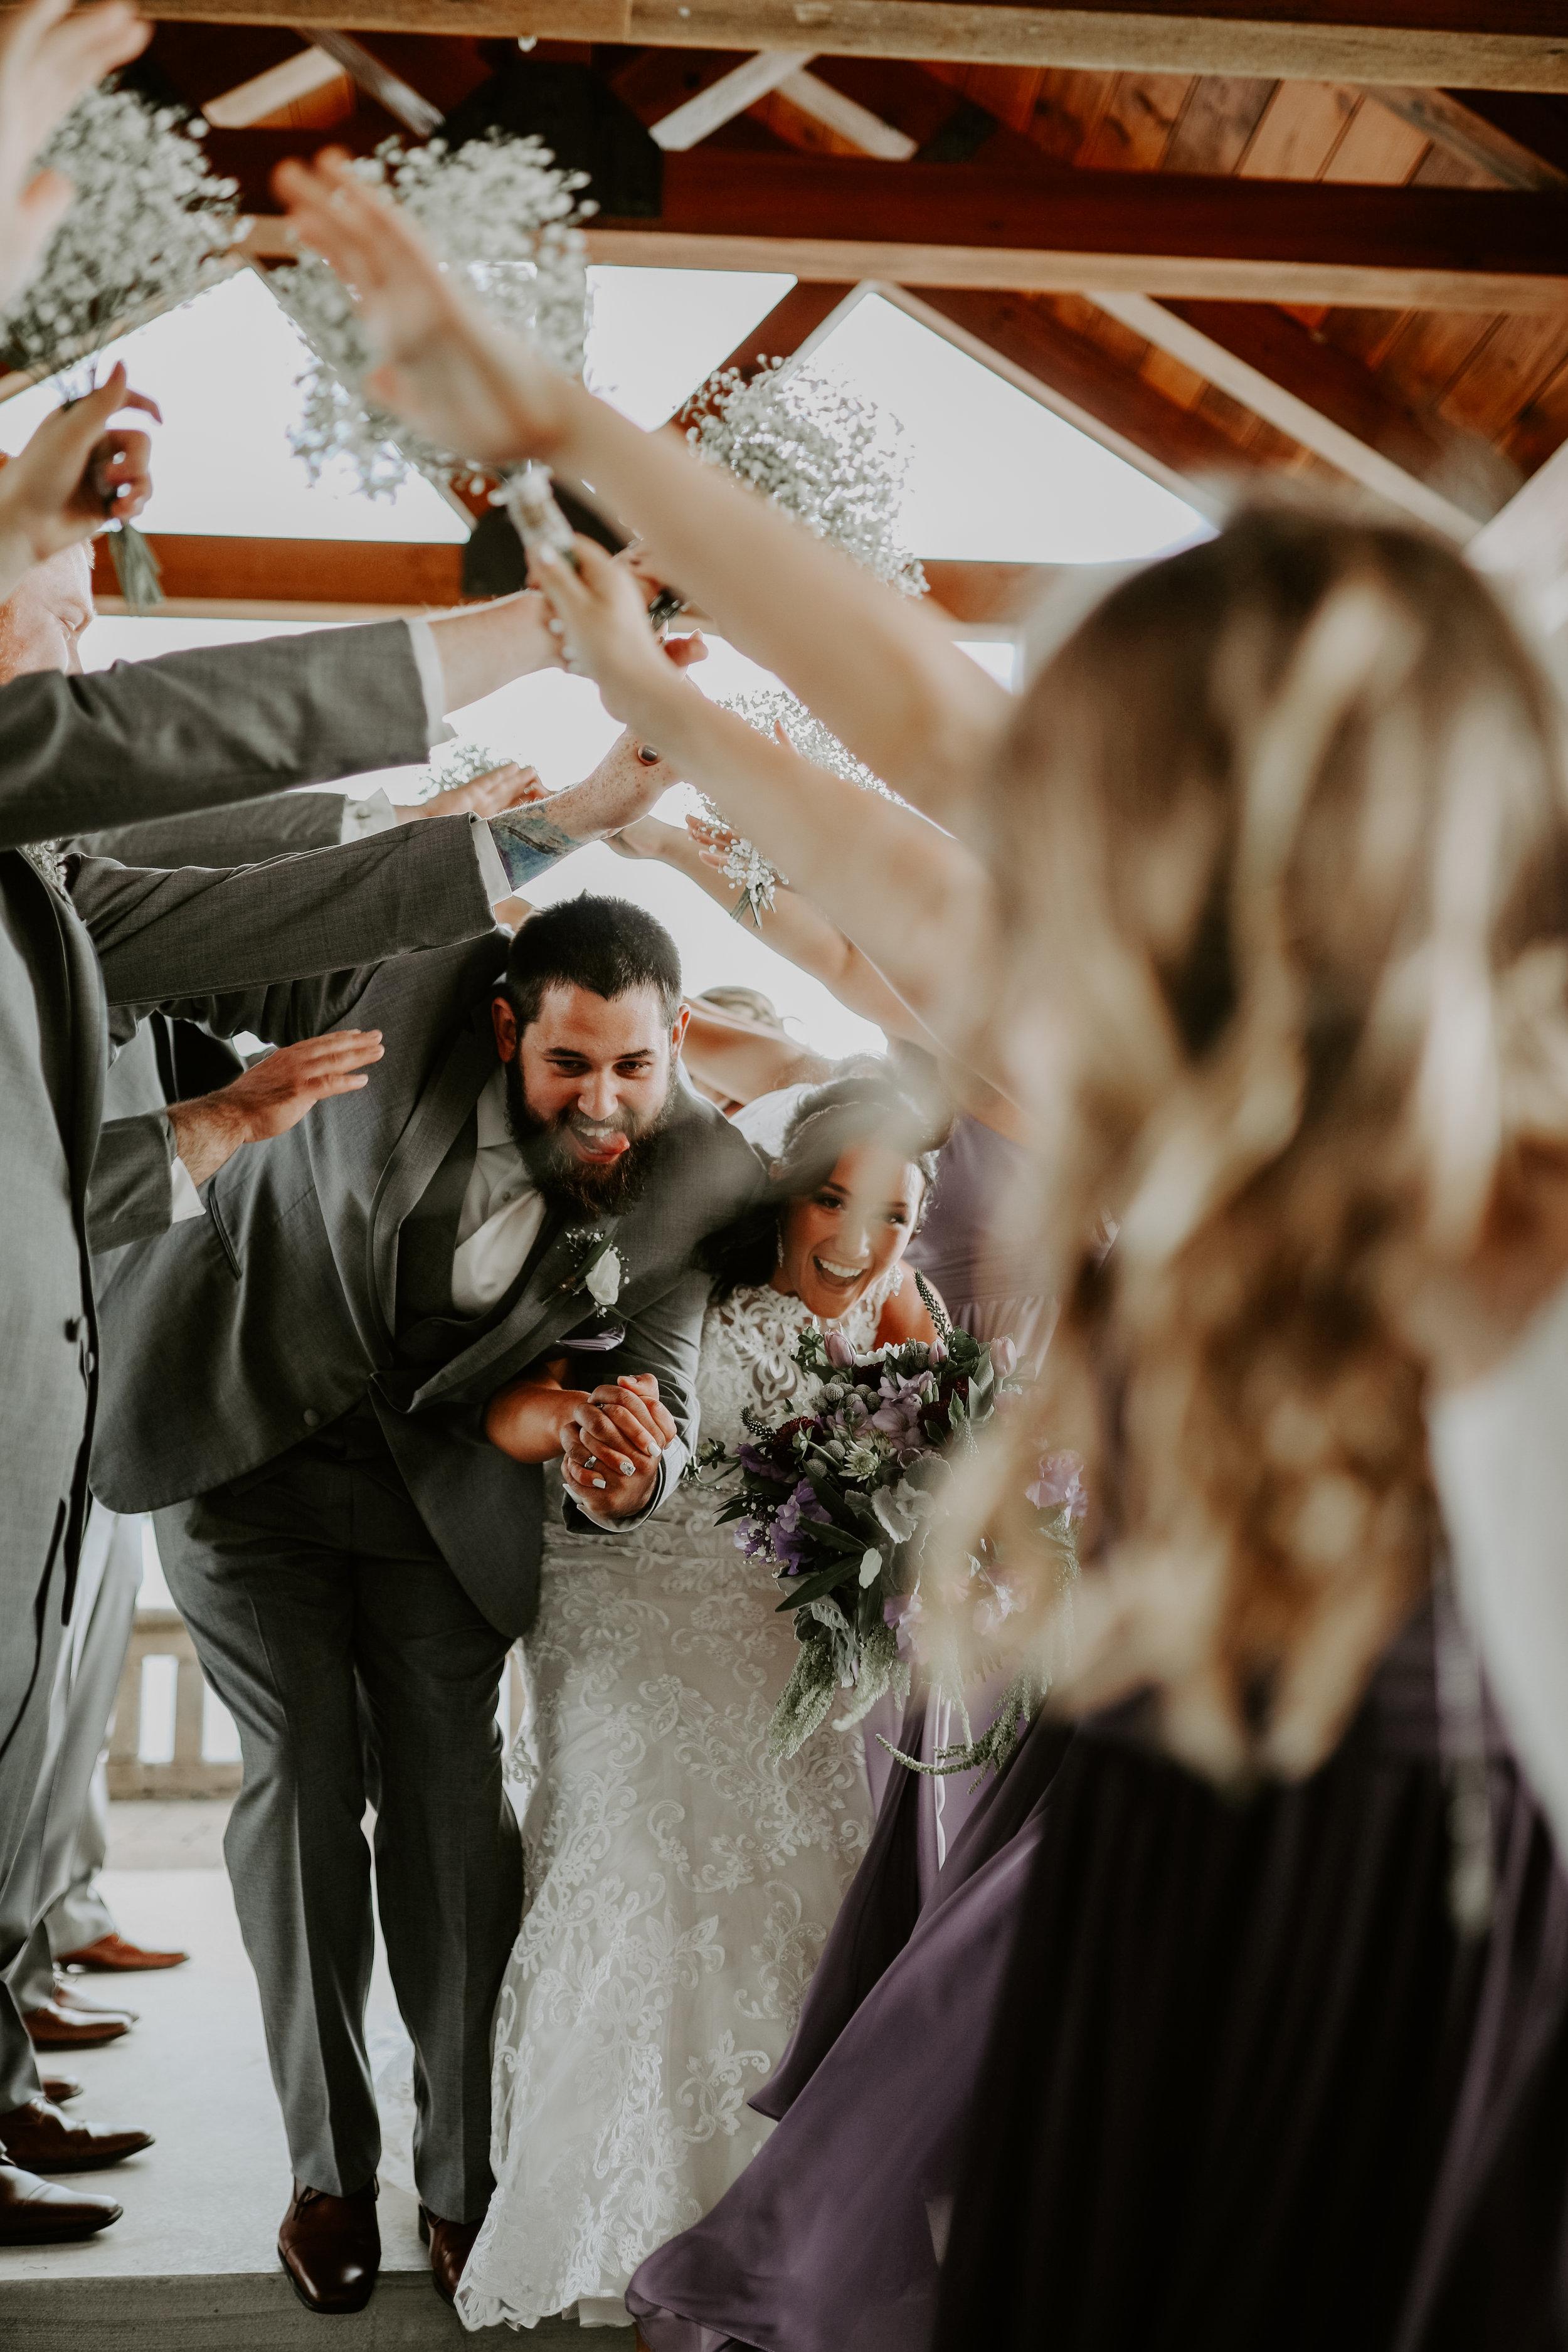 Kylei + Jordan wedding 165 (1 of 1).jpg